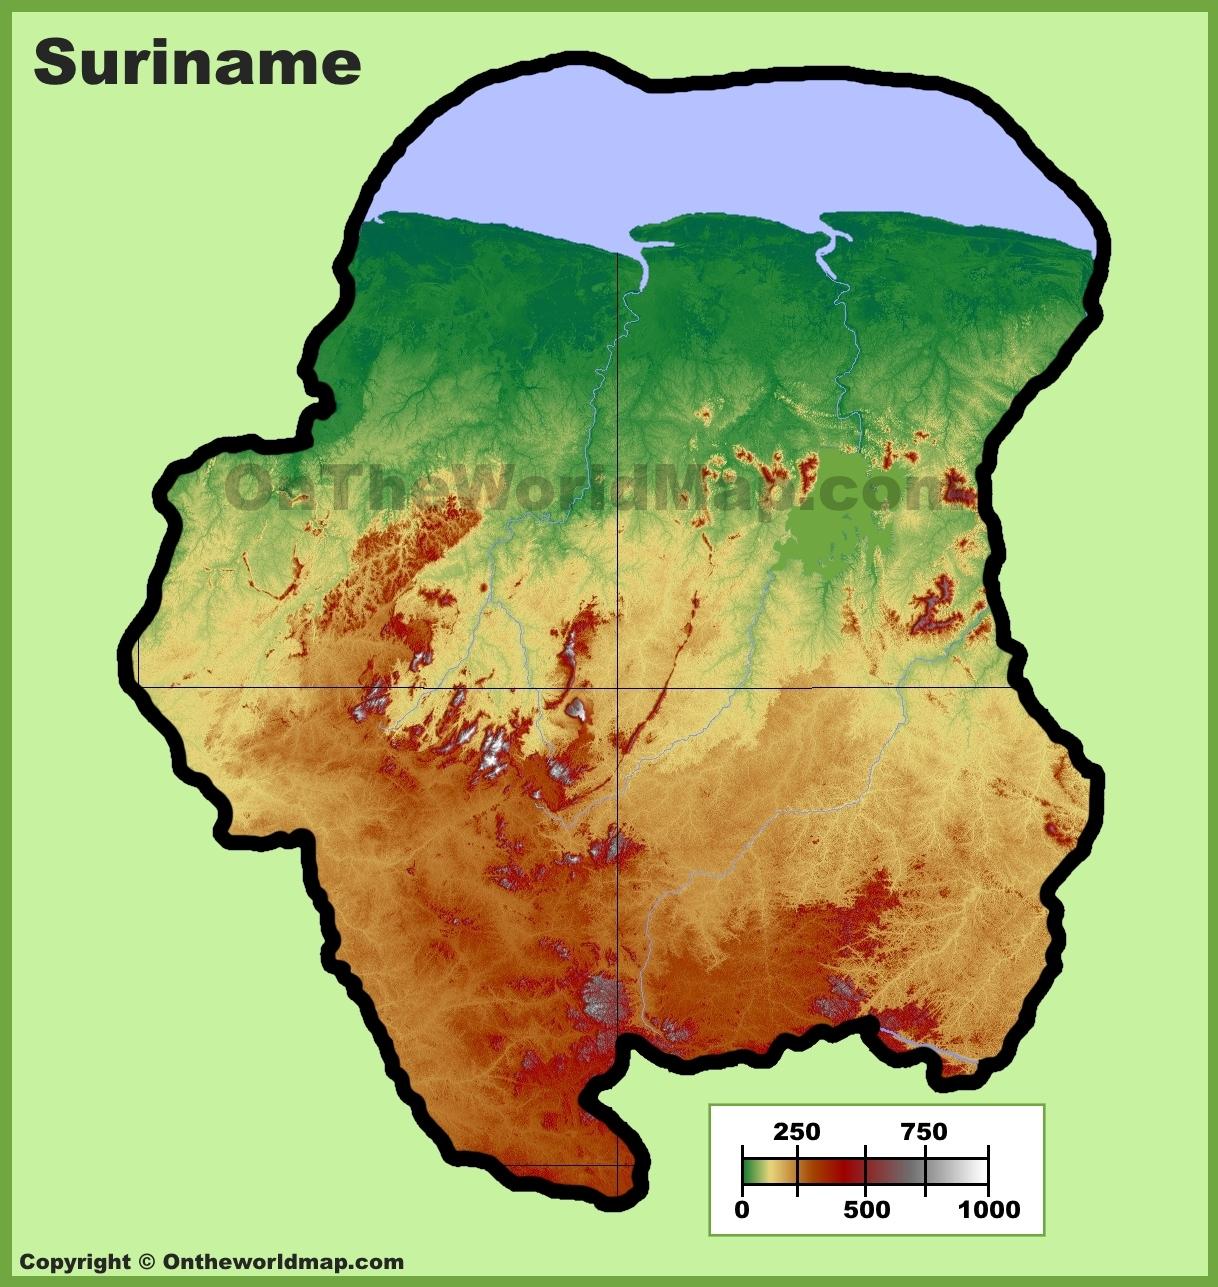 Suriname Physical Map - Suriname map